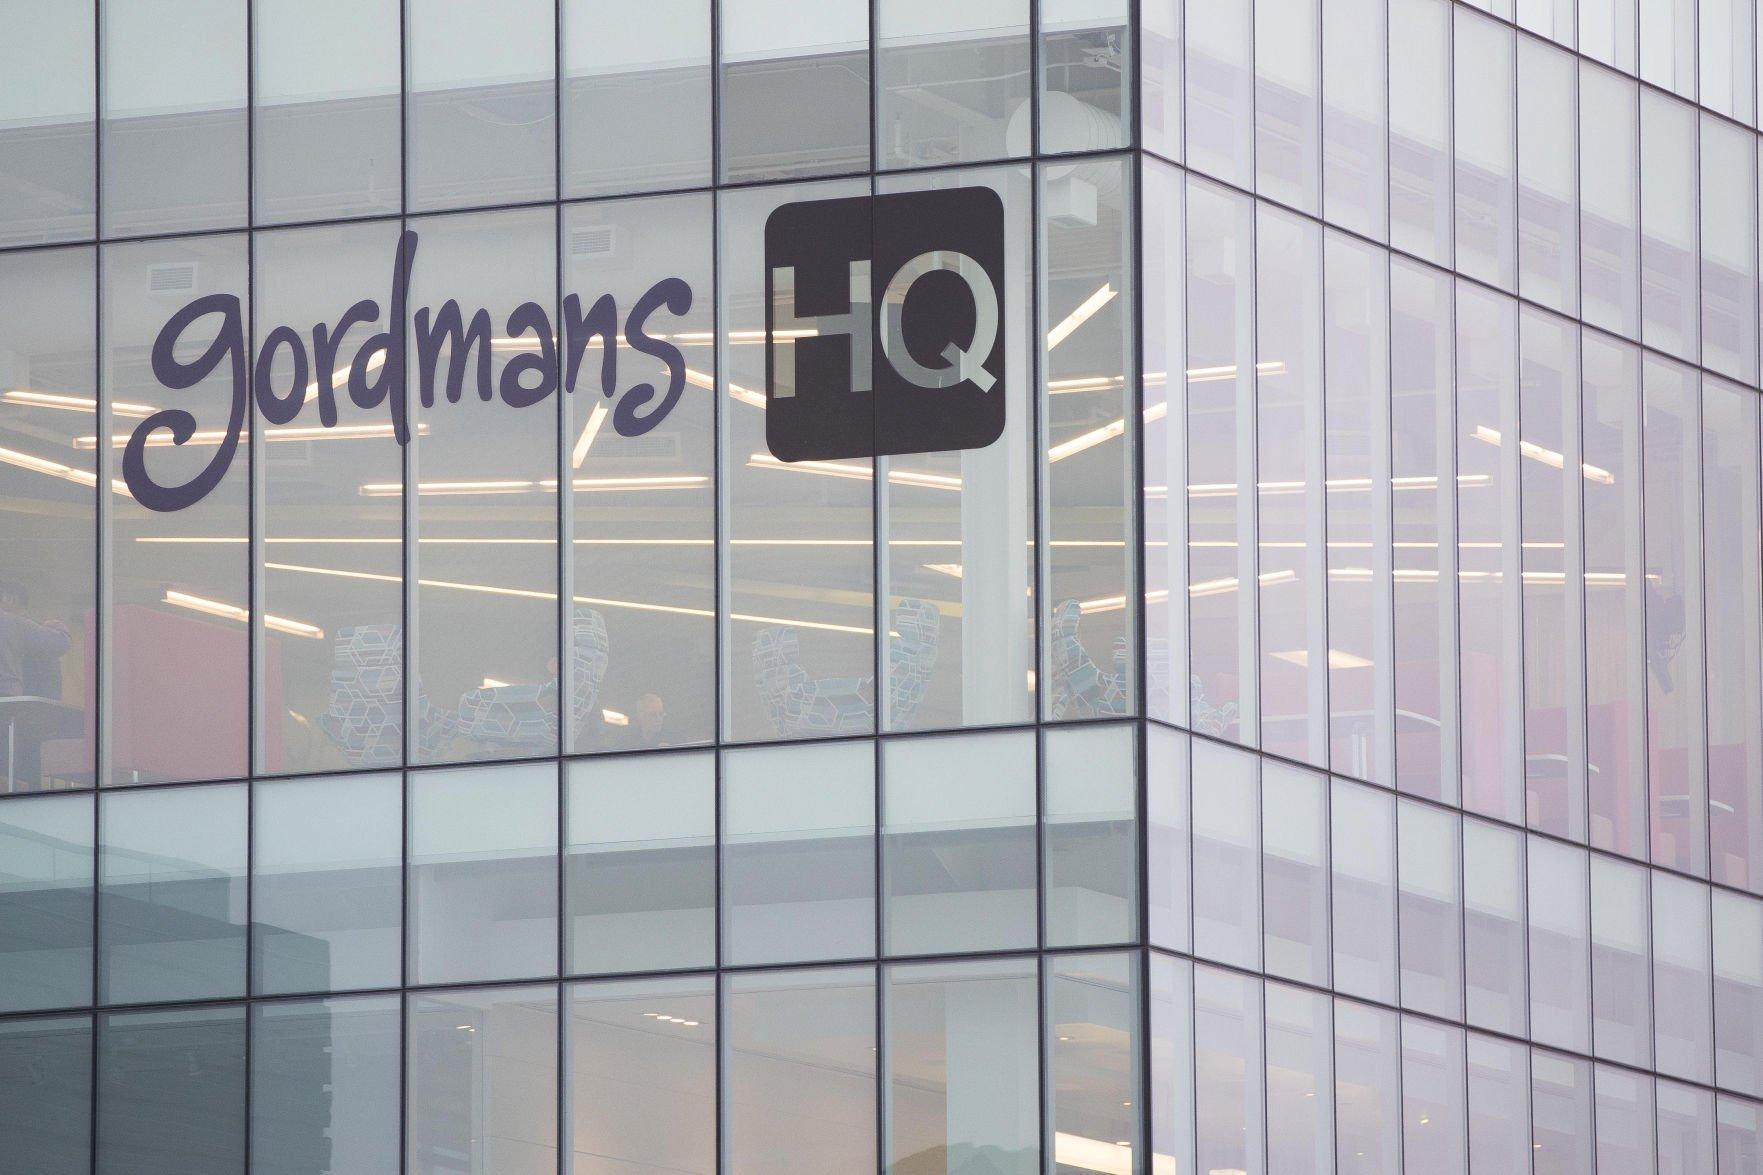 Gordmans headquarters Uncertainty lies ahead for Gordmansu0027